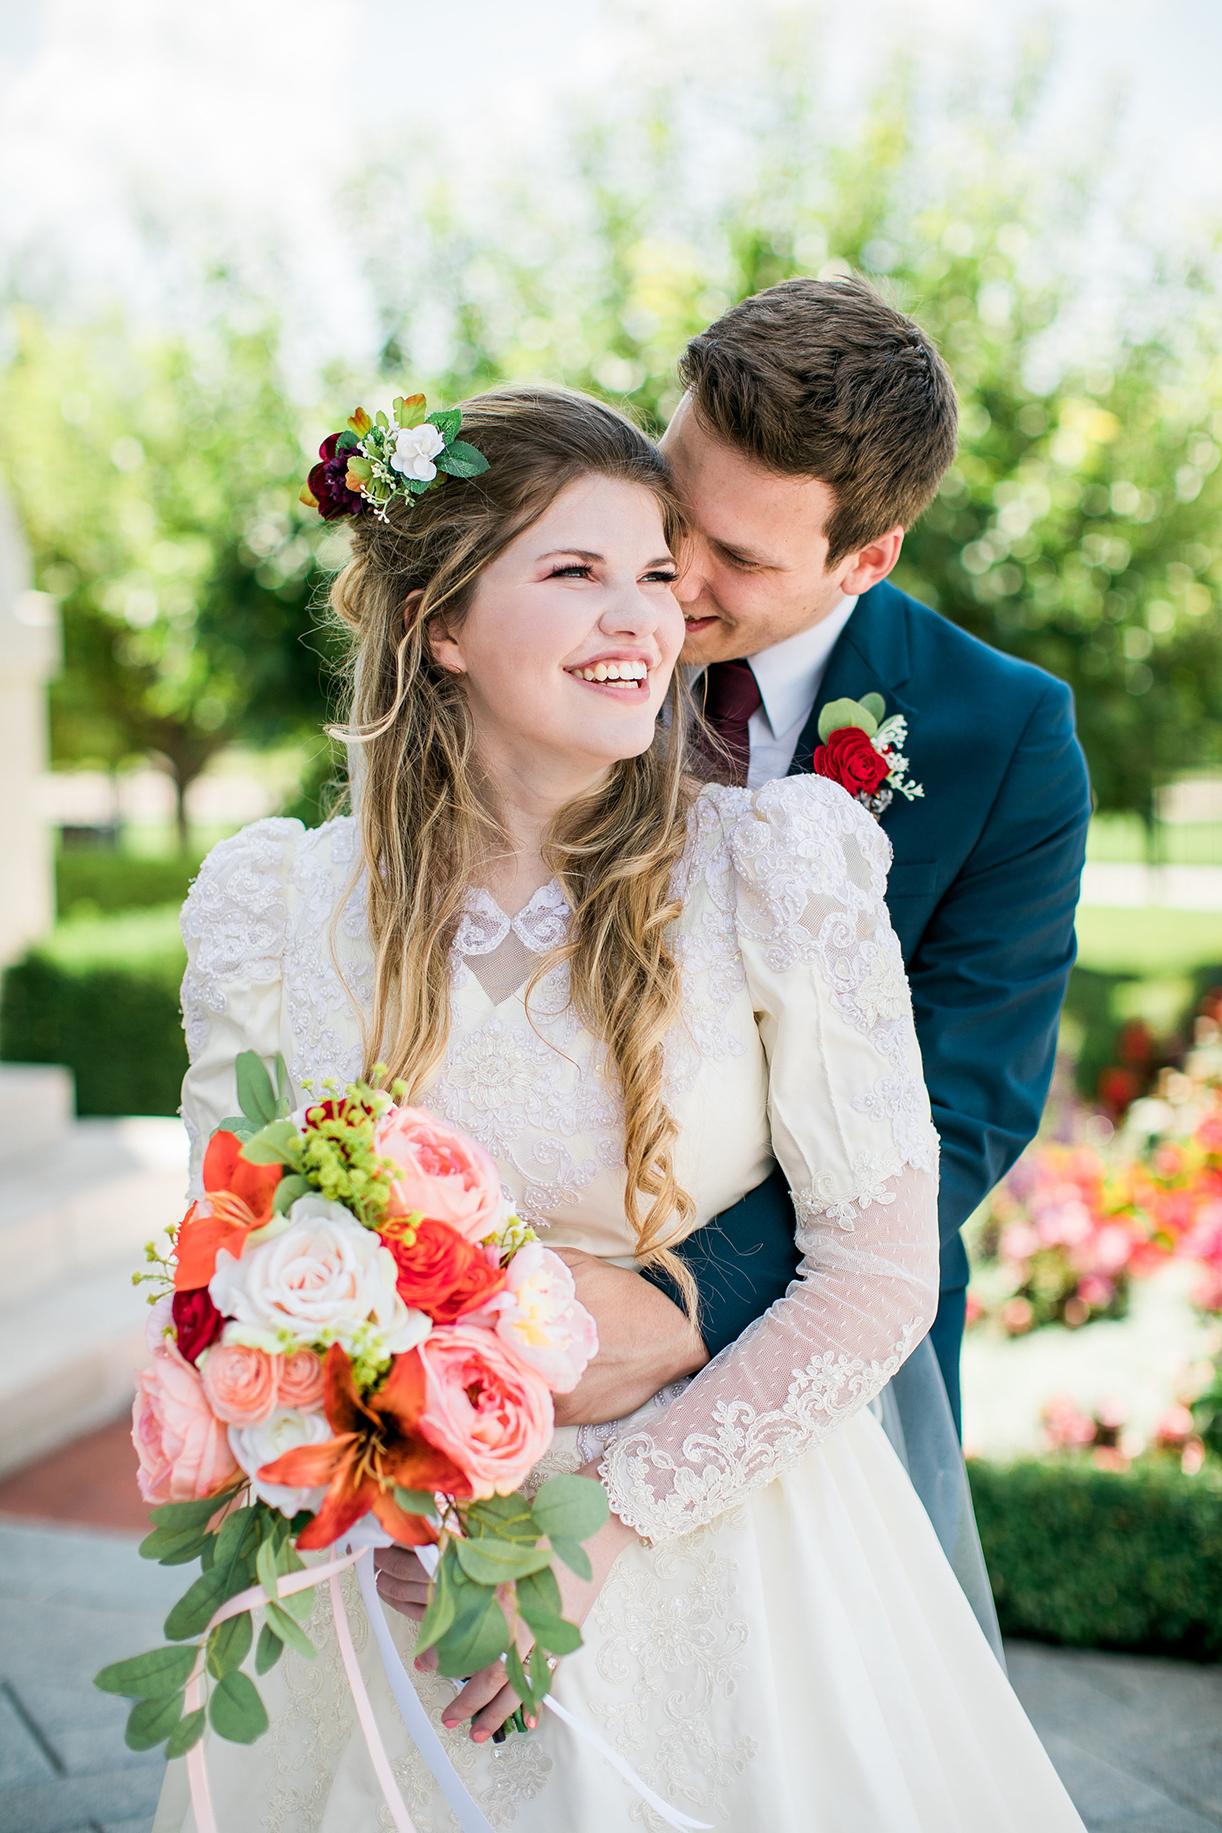 Jared Gabby Wedding August 1 2018-print-0141.jpg